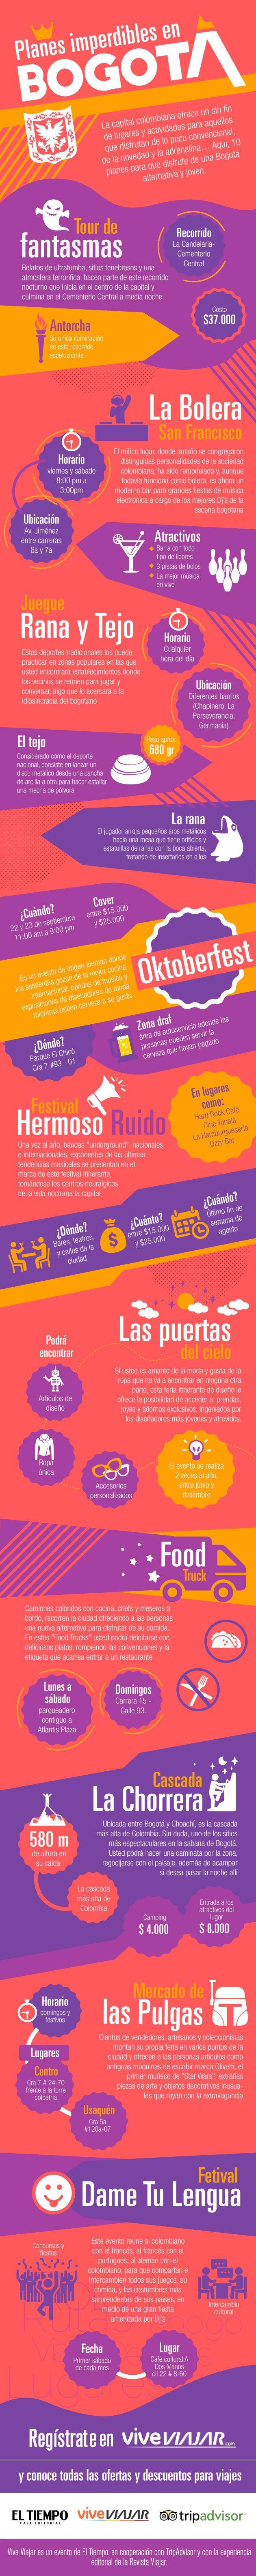 10 planes imperdibles en Bogotá